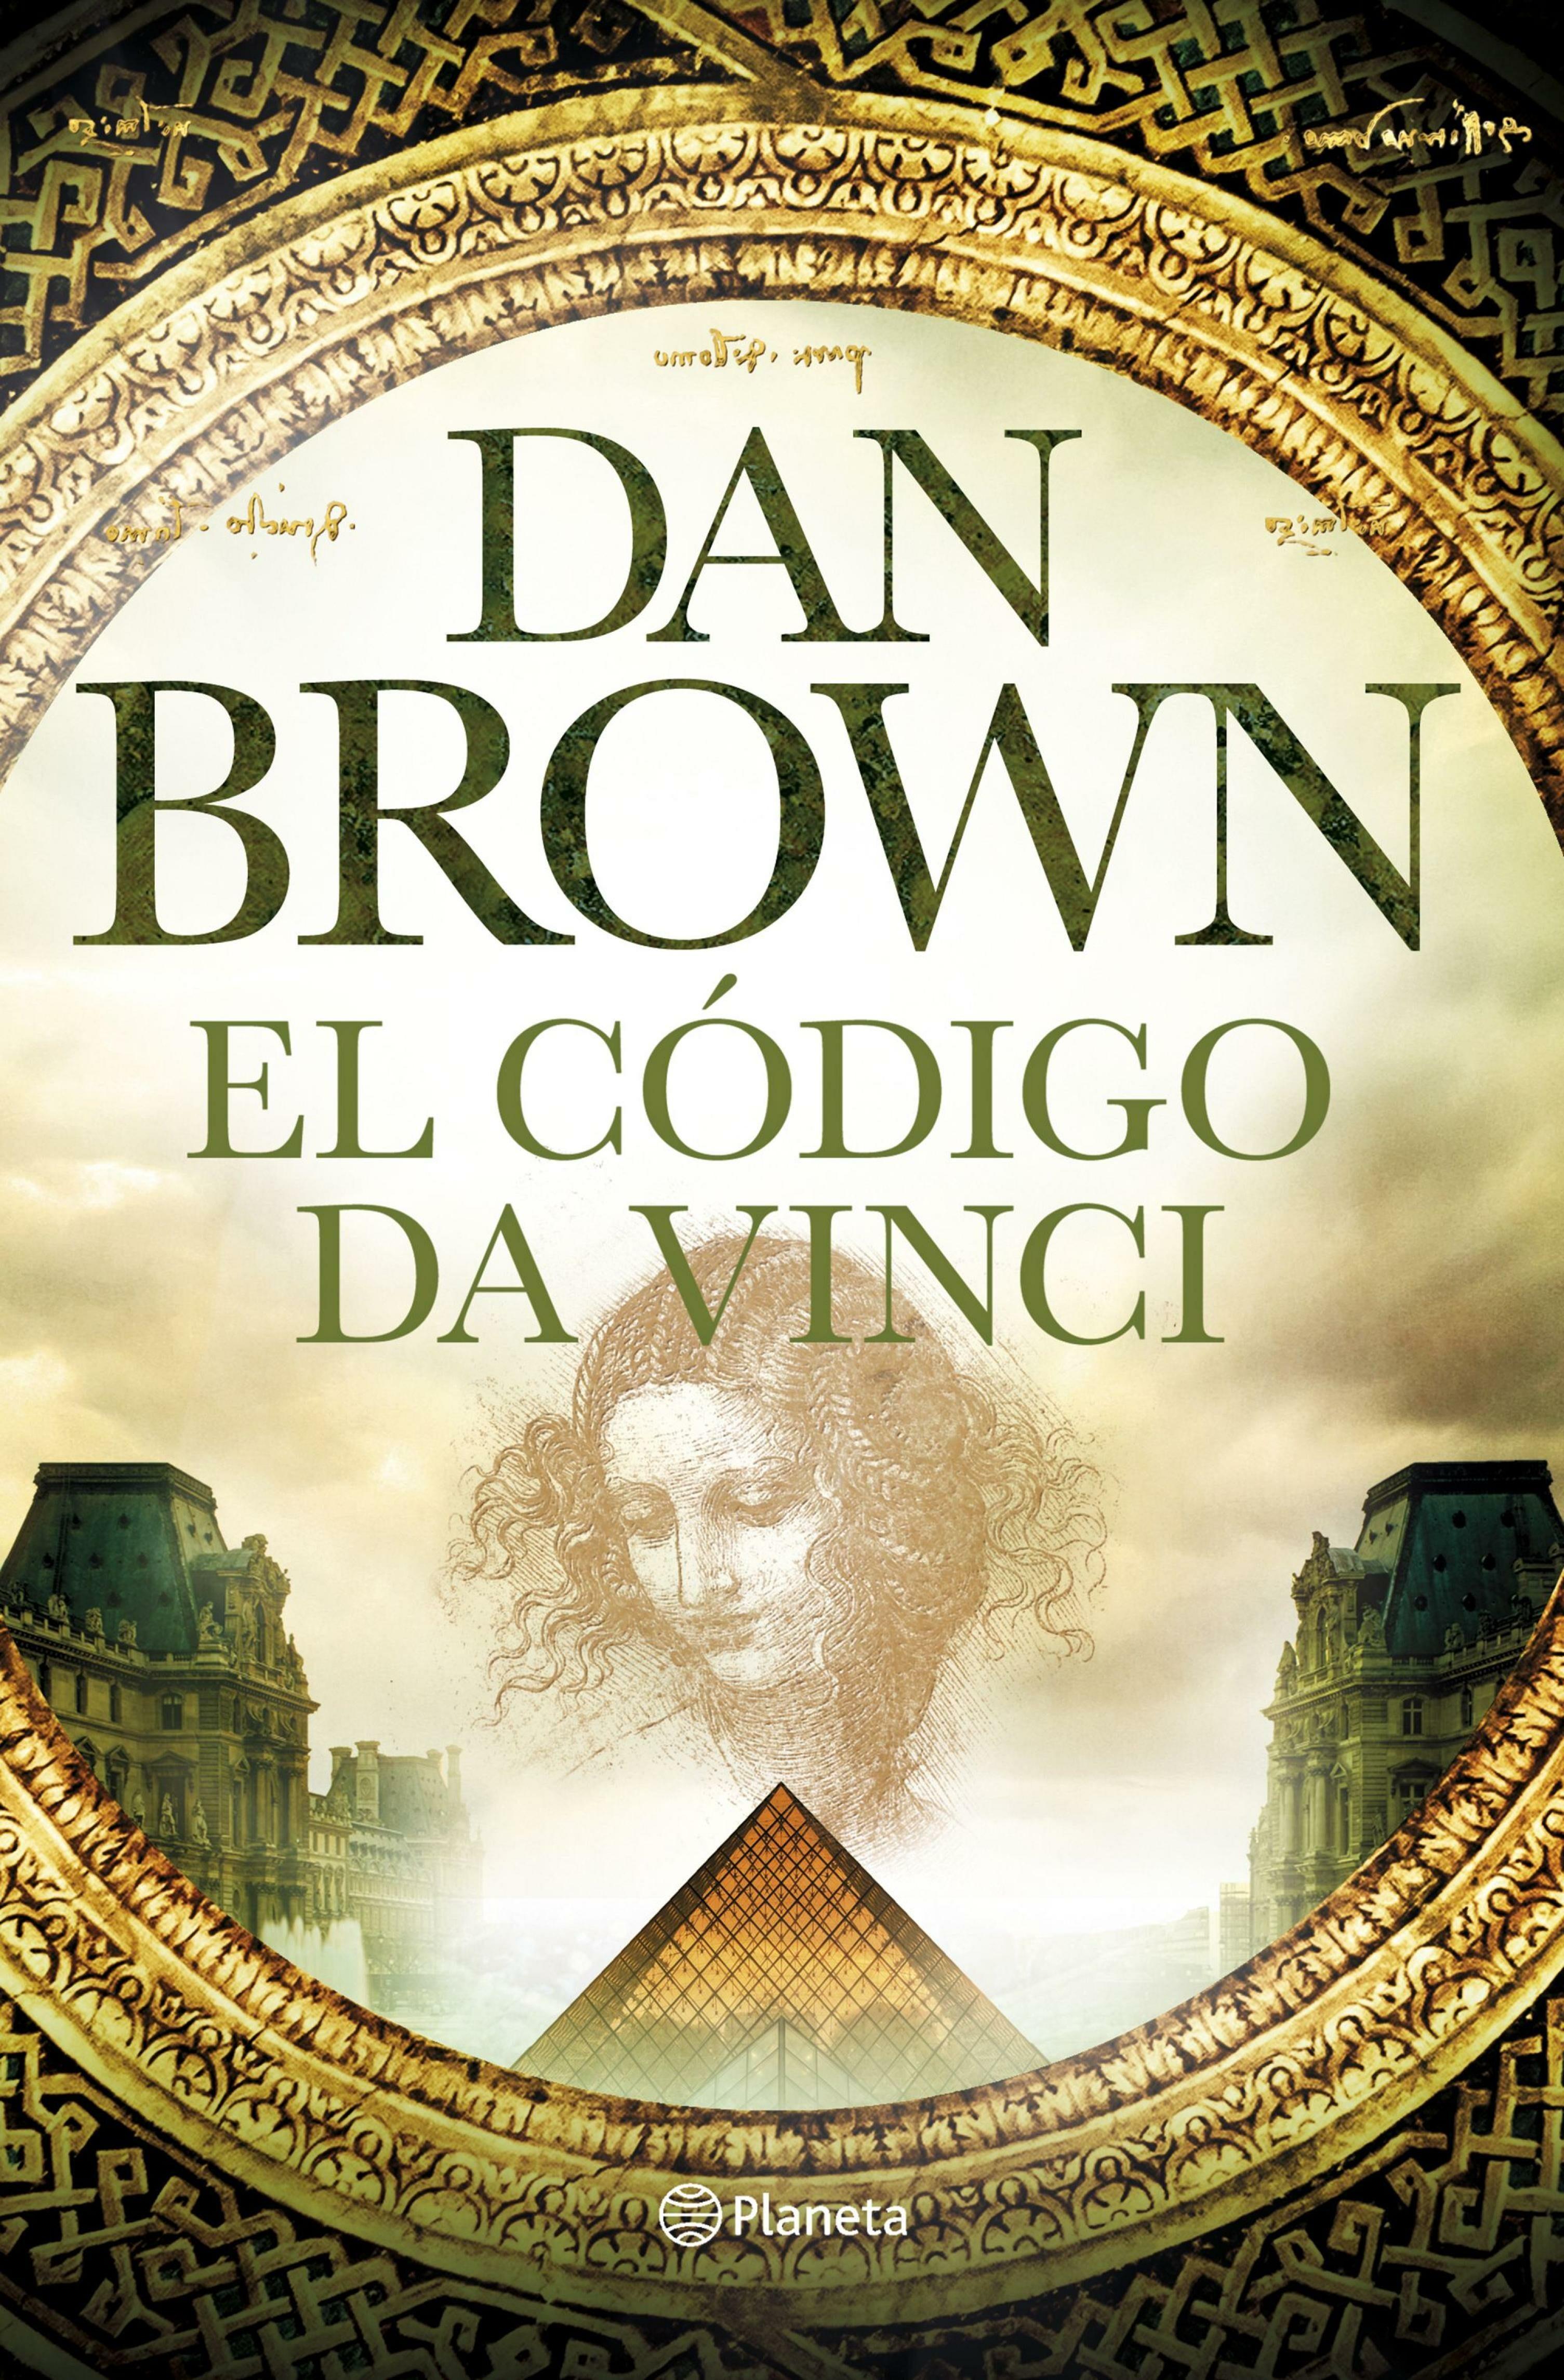 El C�digo Da Vinci (ebook)dan Brown9788408013259